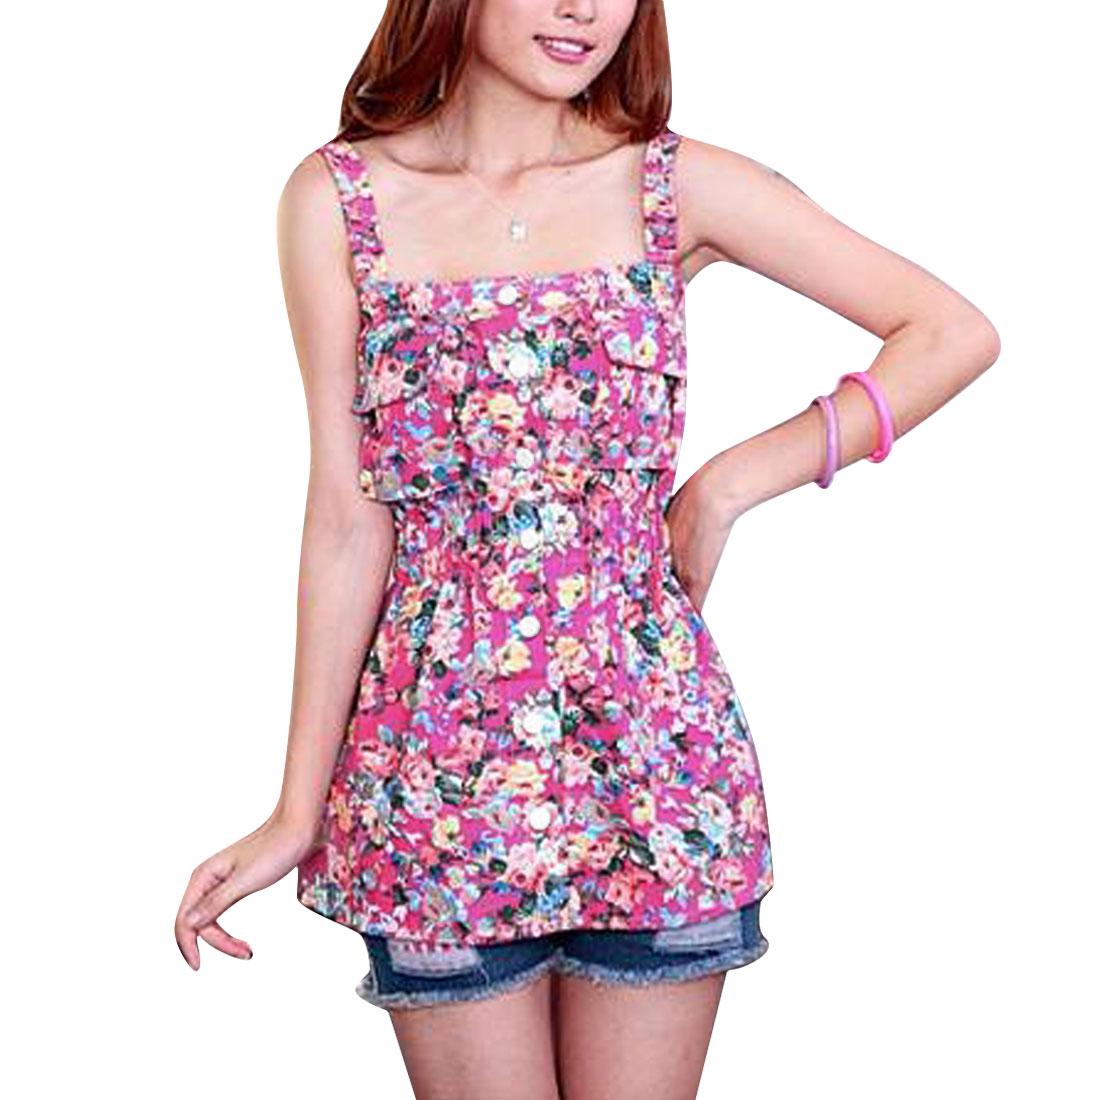 Women Elastic Waist Floral Prints Tank Top Fuchsia Pink XS